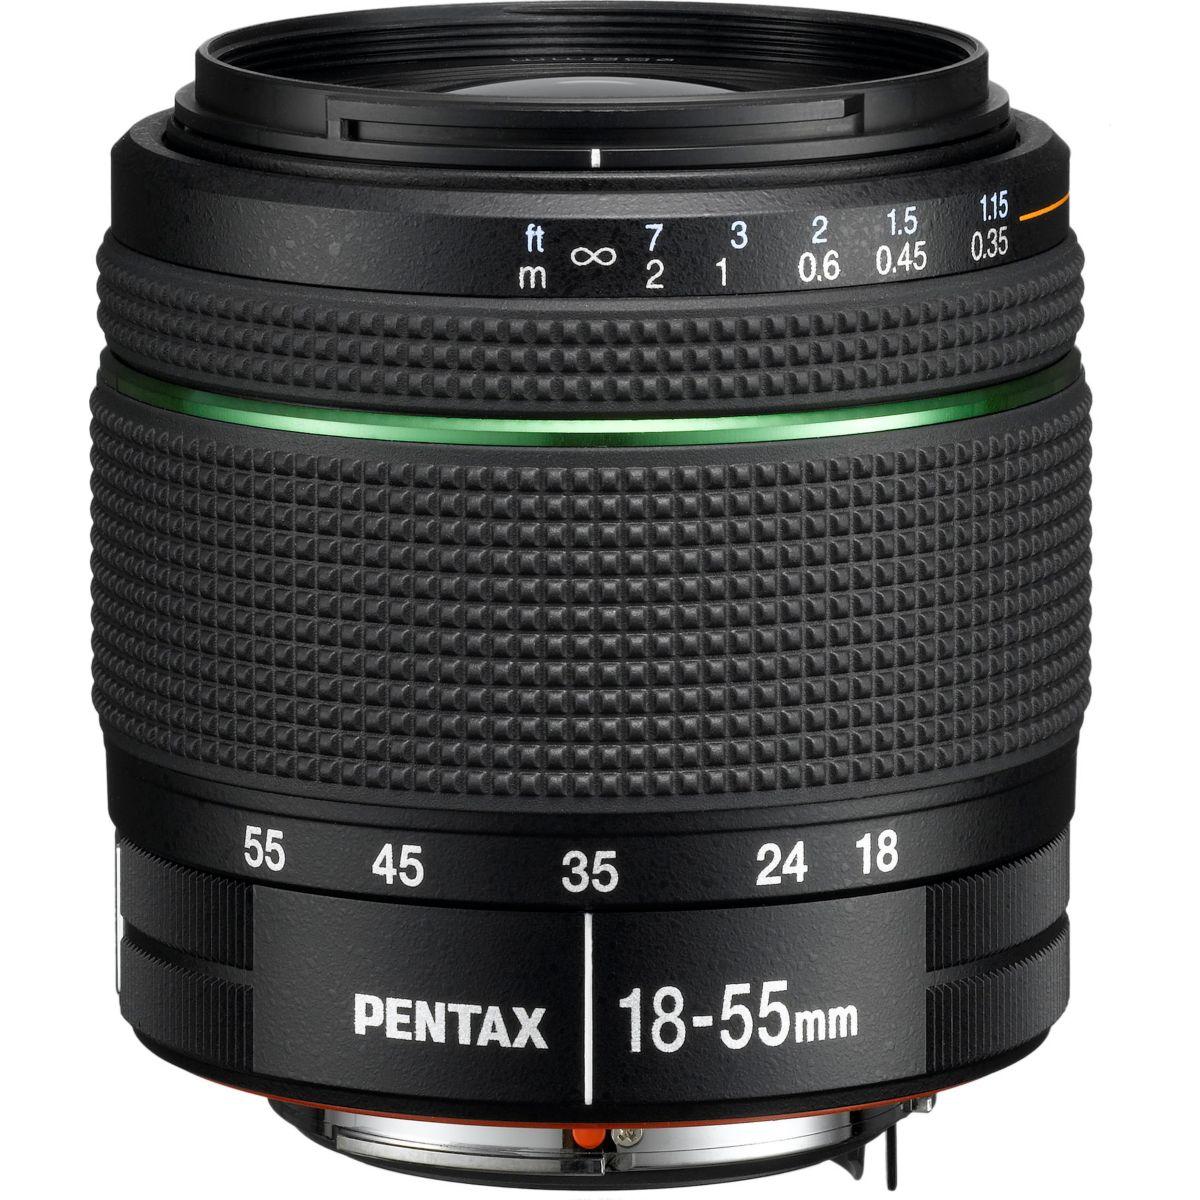 Objectif PENTAX 18-55mm f/3,5-5,6 AL WR